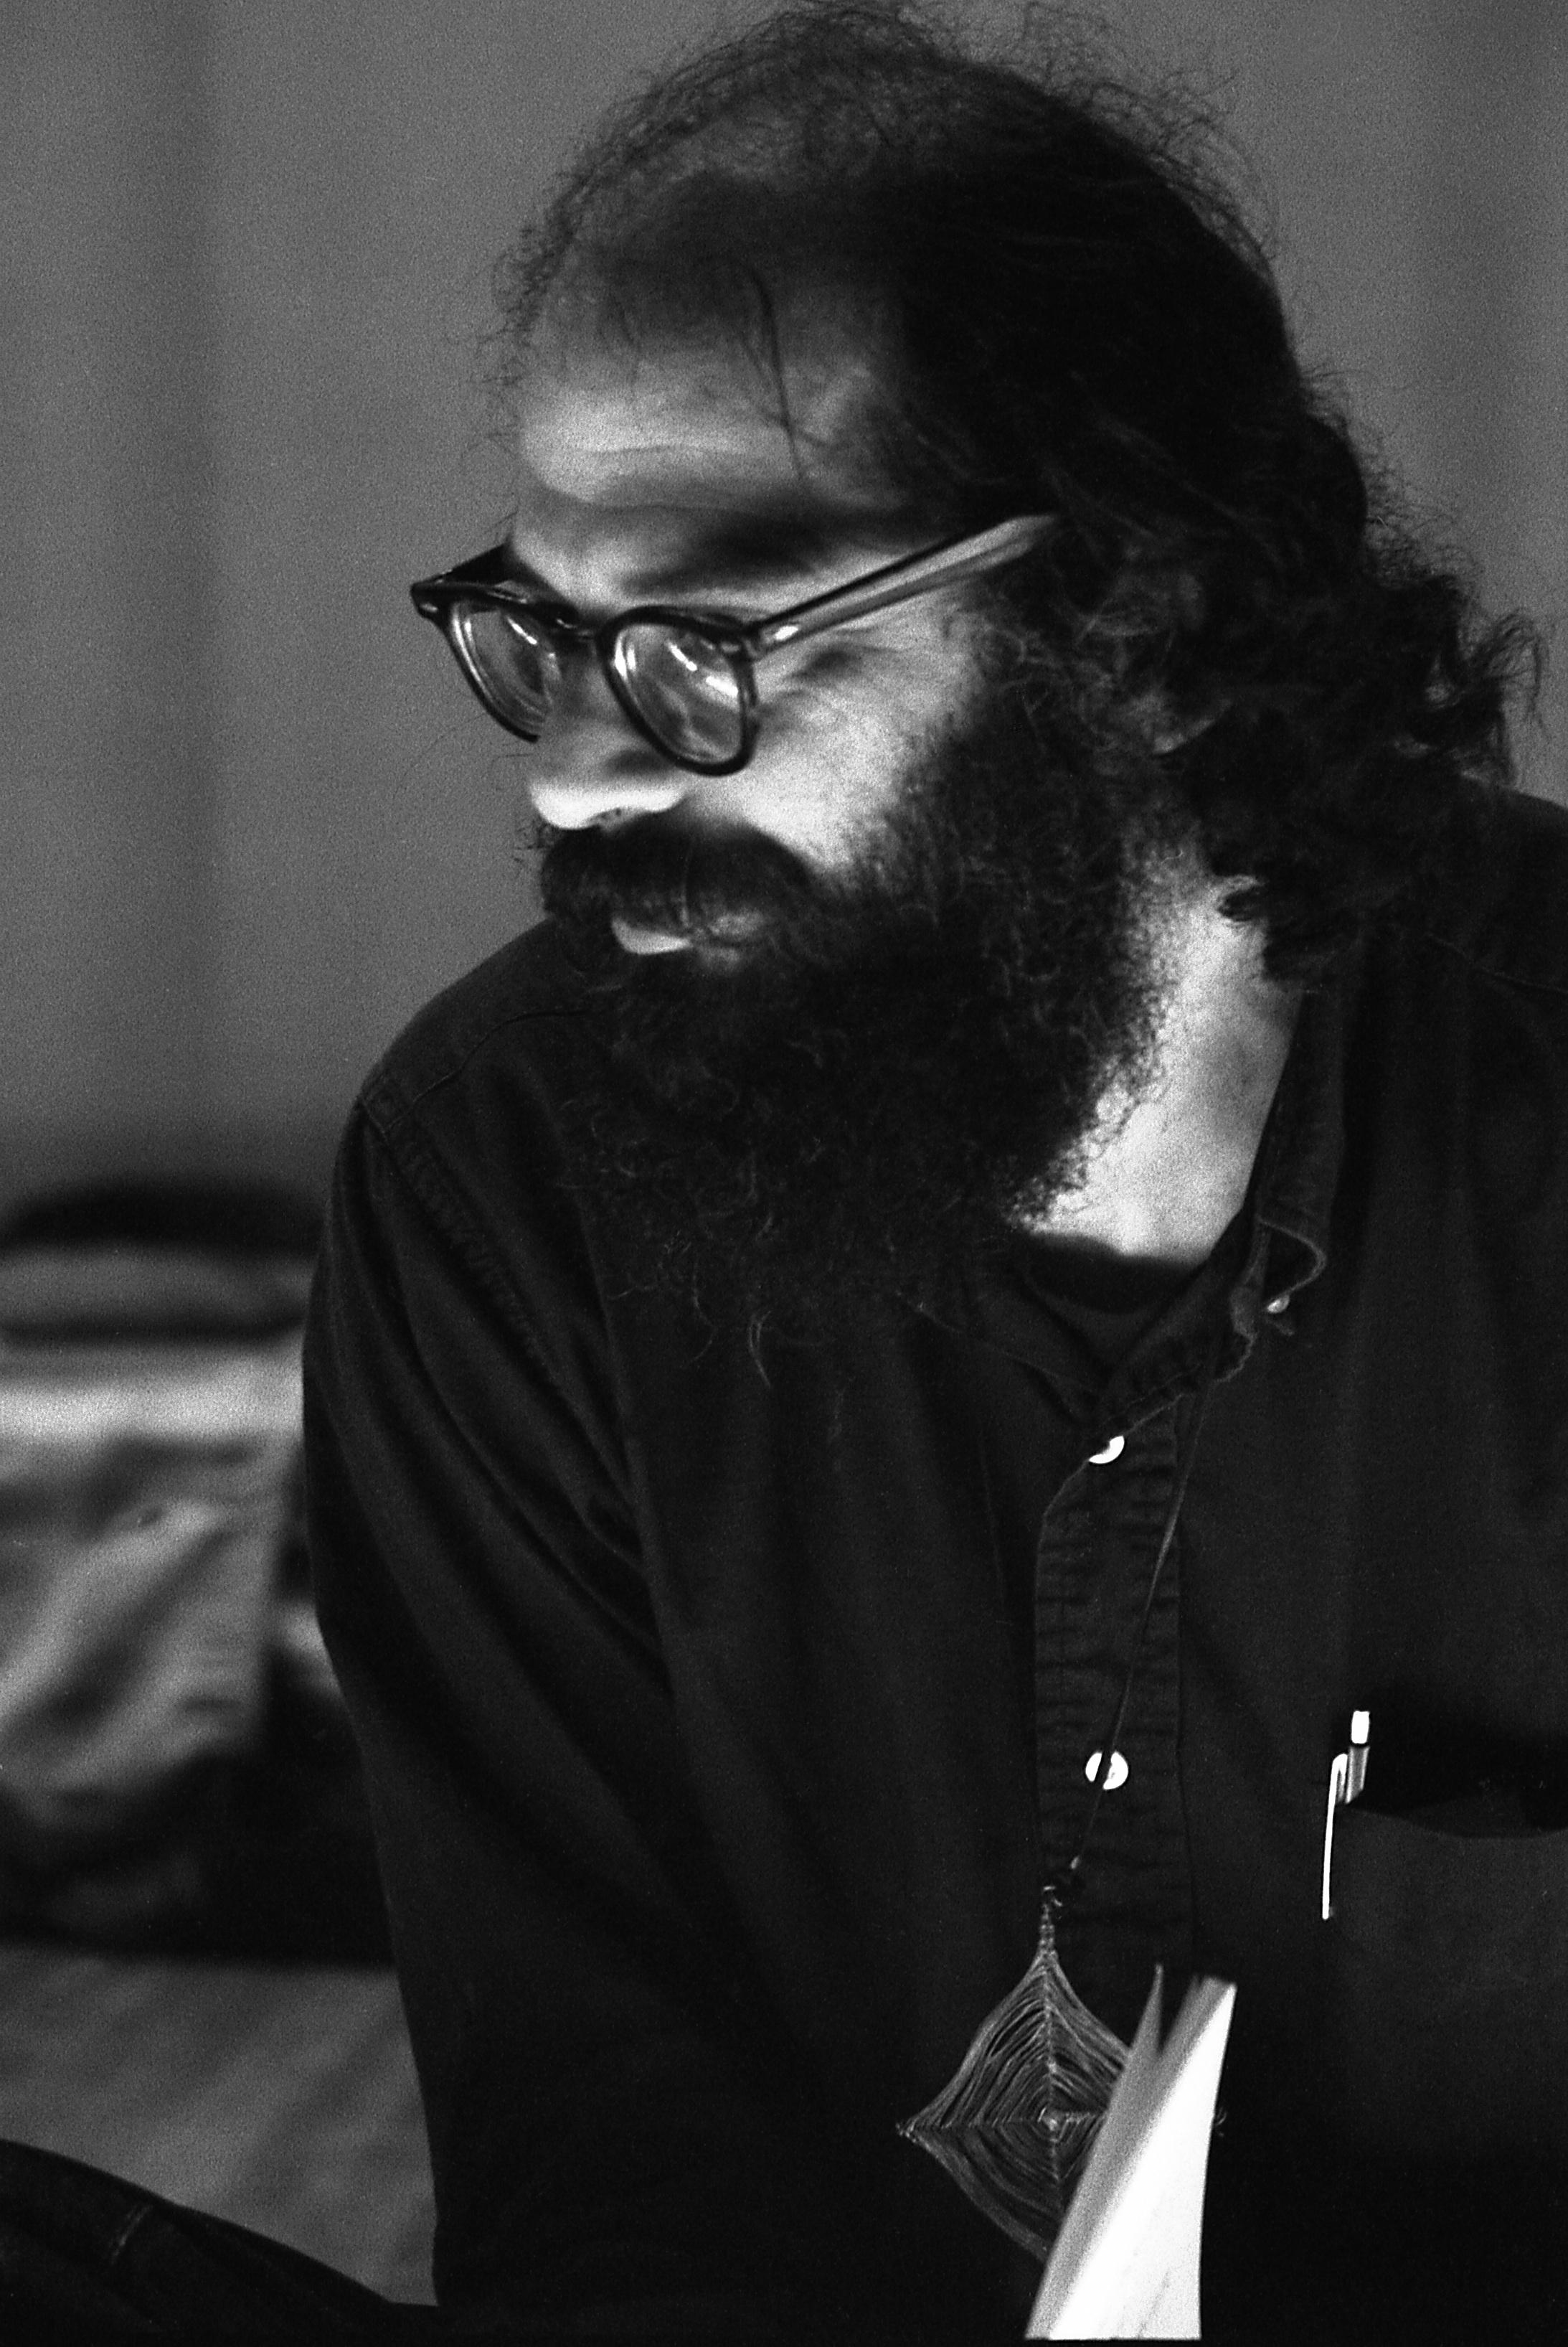 1. kép Allen Ginsberg portréja © Fotó: Alain Dister